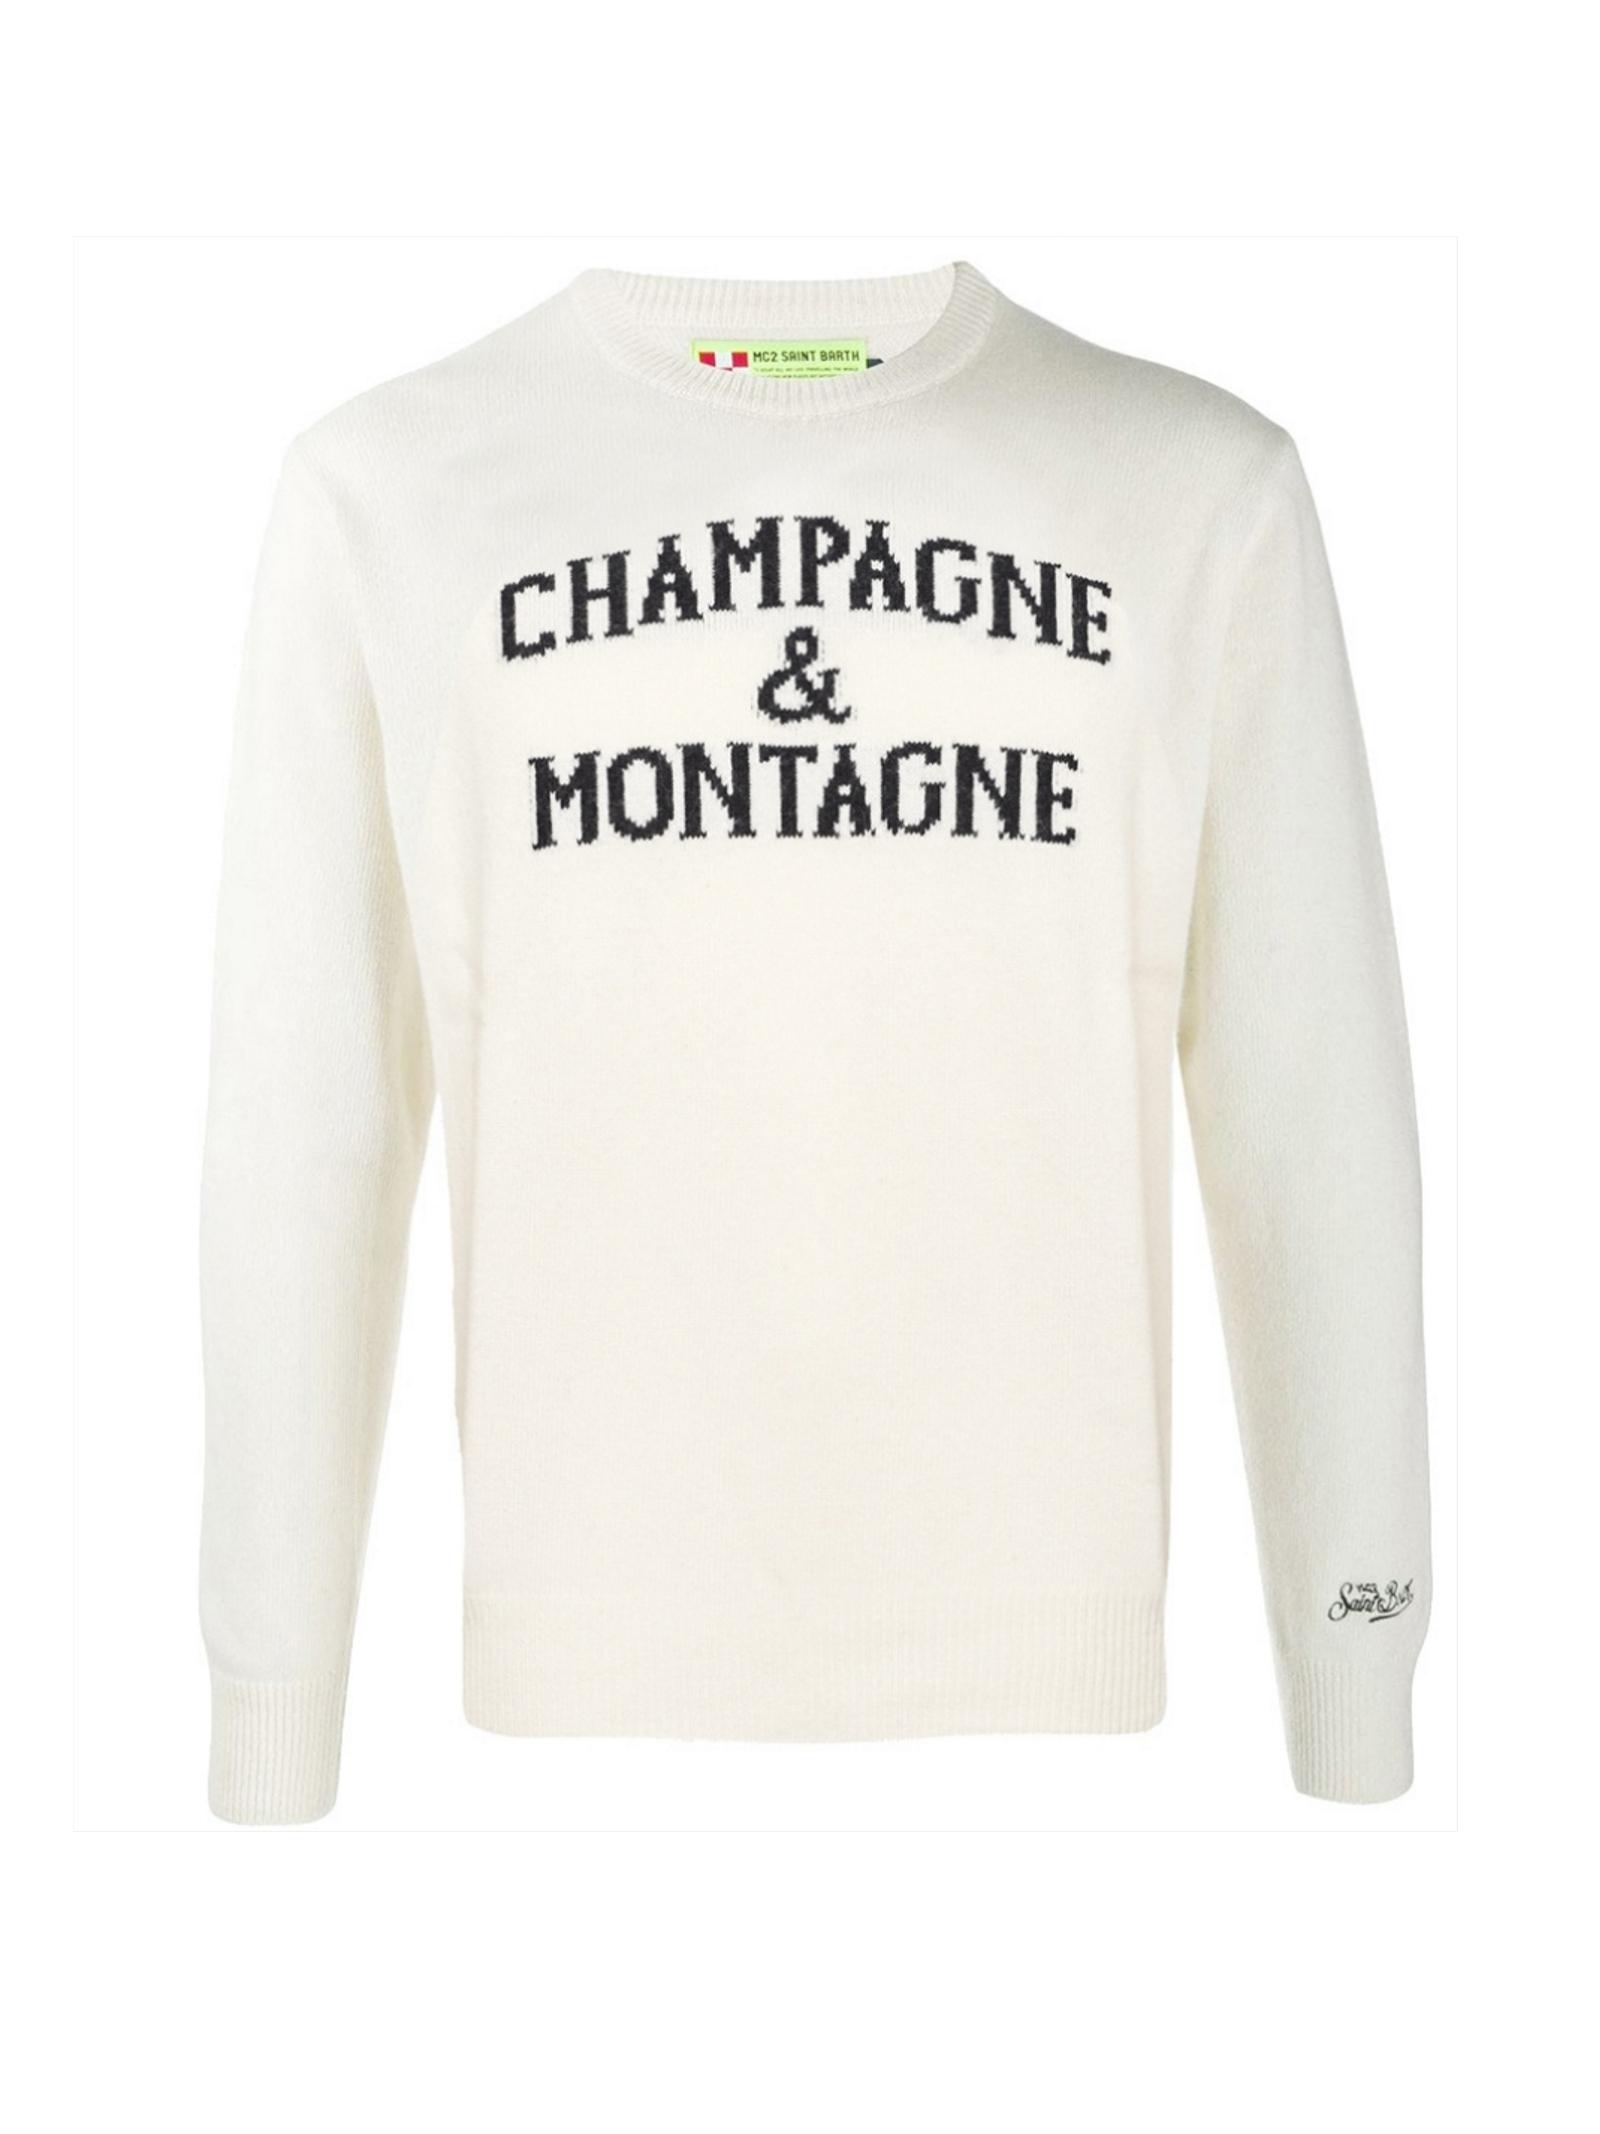 Pullover Champagne & Montagne MC2 Saint Barth MC2  SAINT BARTH   1   MNCH1010